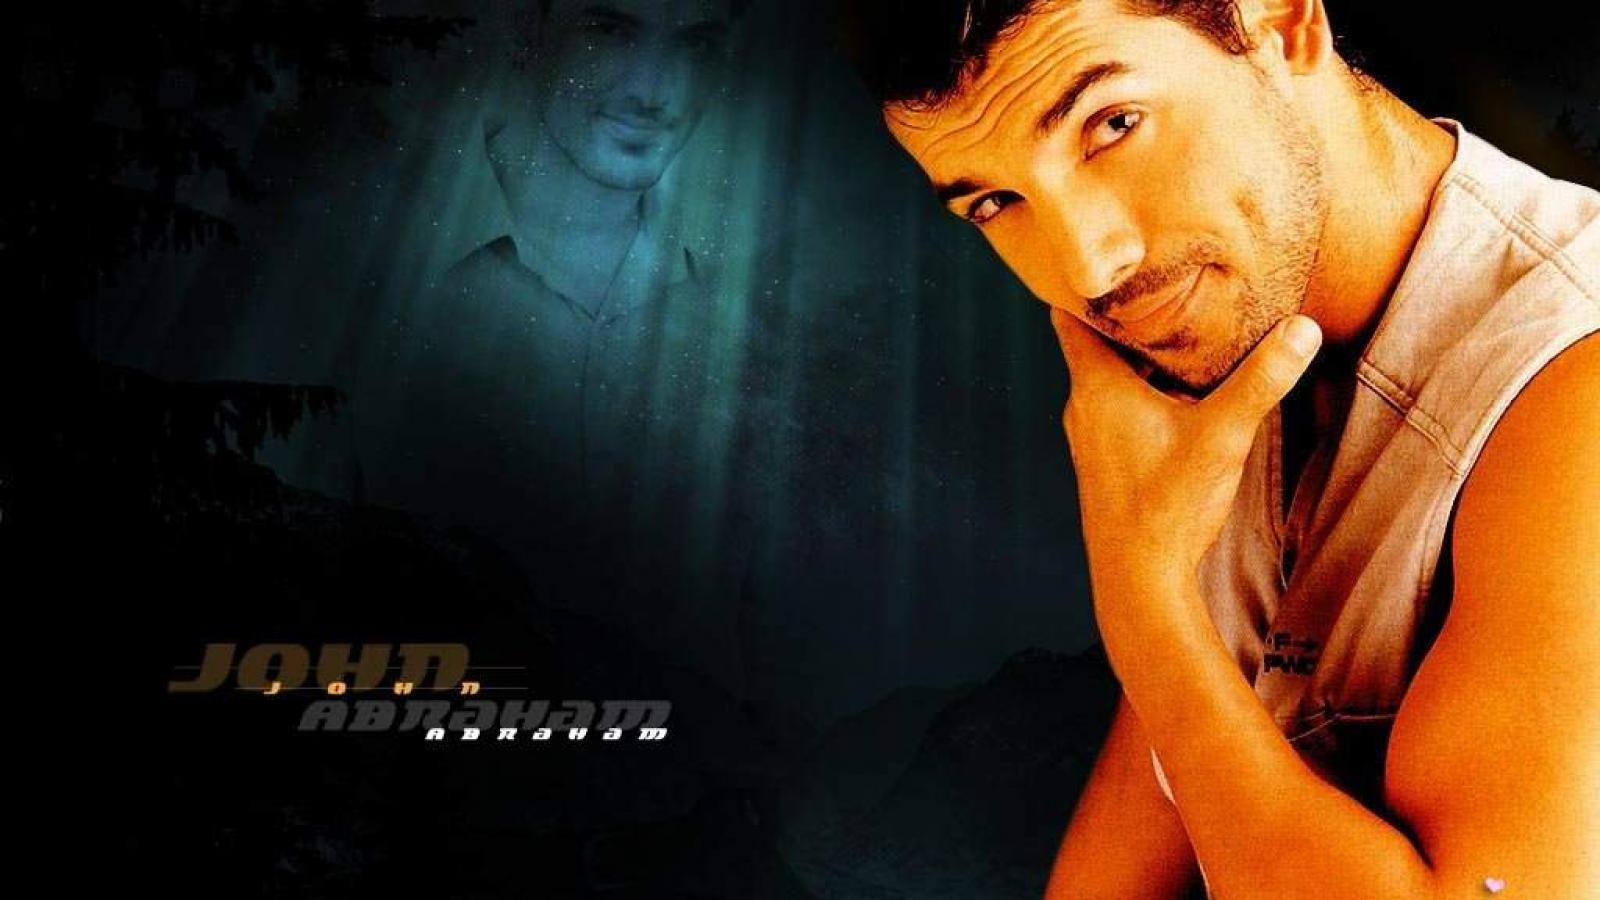 ... katreena kaif wallpapers|katreena kaif pictures|film actors| film